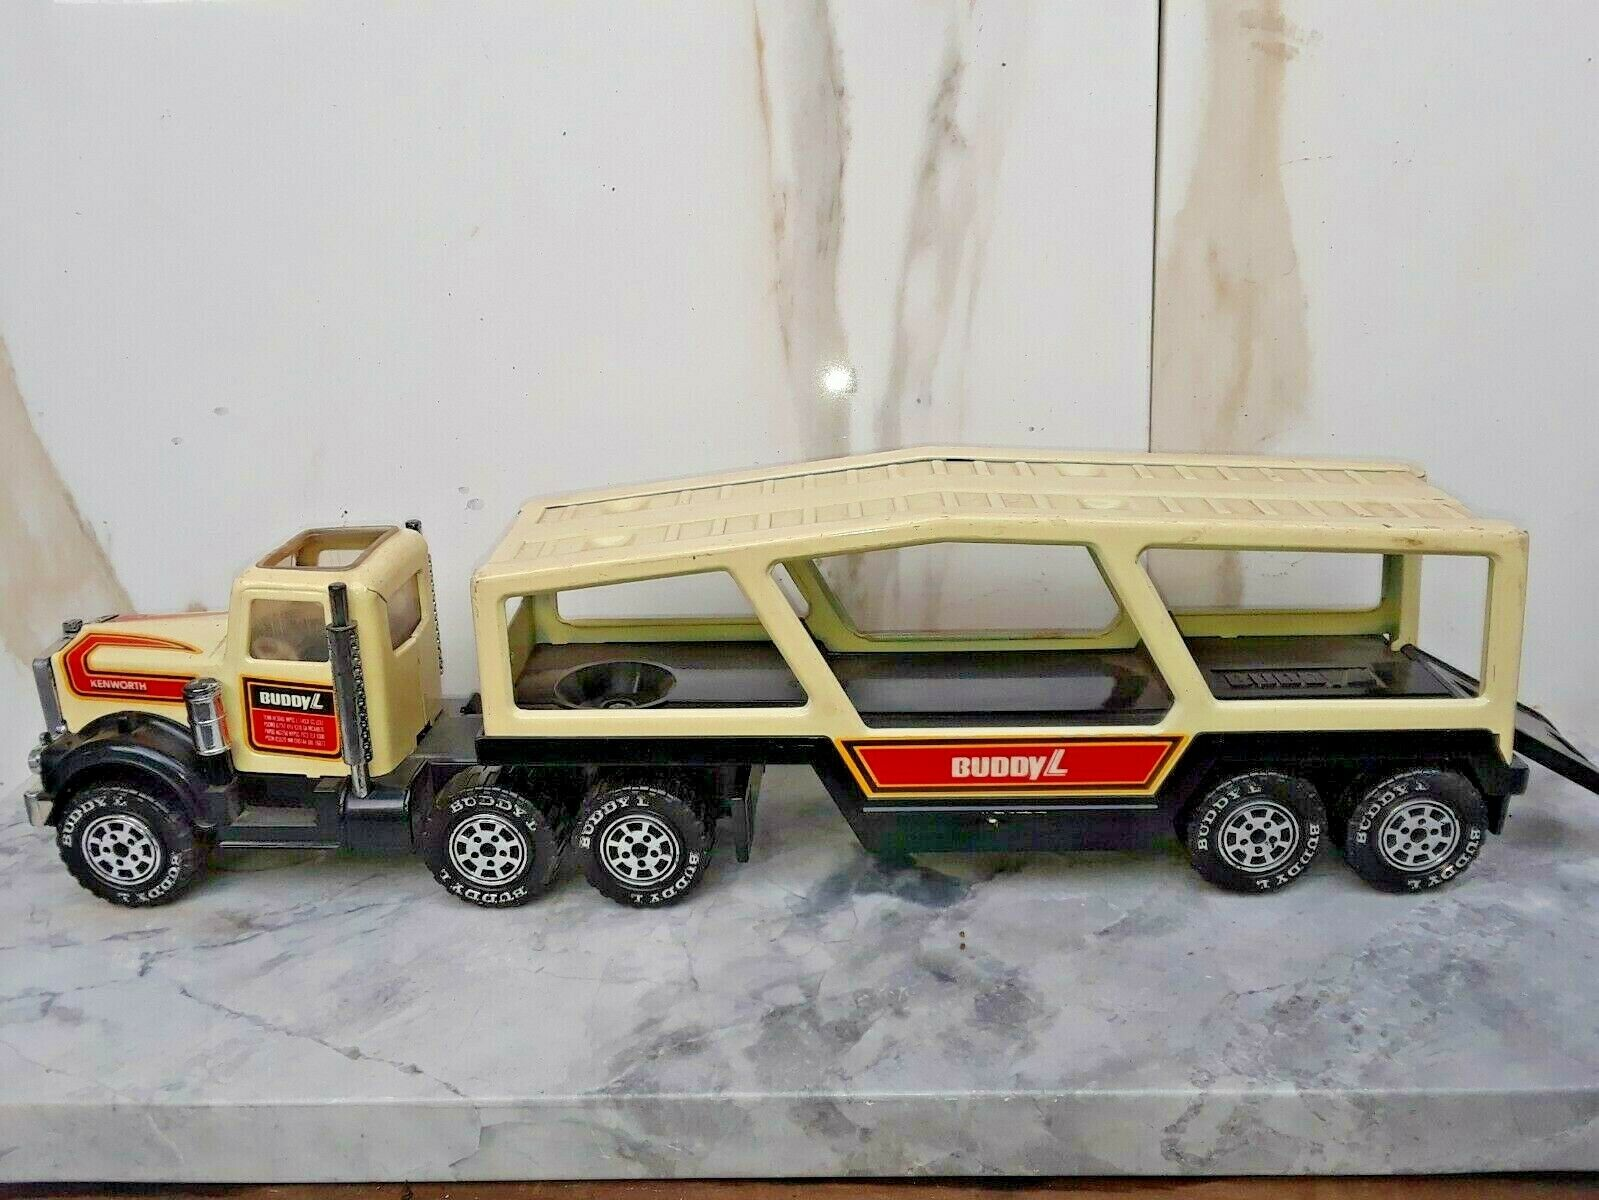 1980'S BUDDY L BOAT HAULER CARRIER METAL & PLASTIC Spielzeug TRUCK